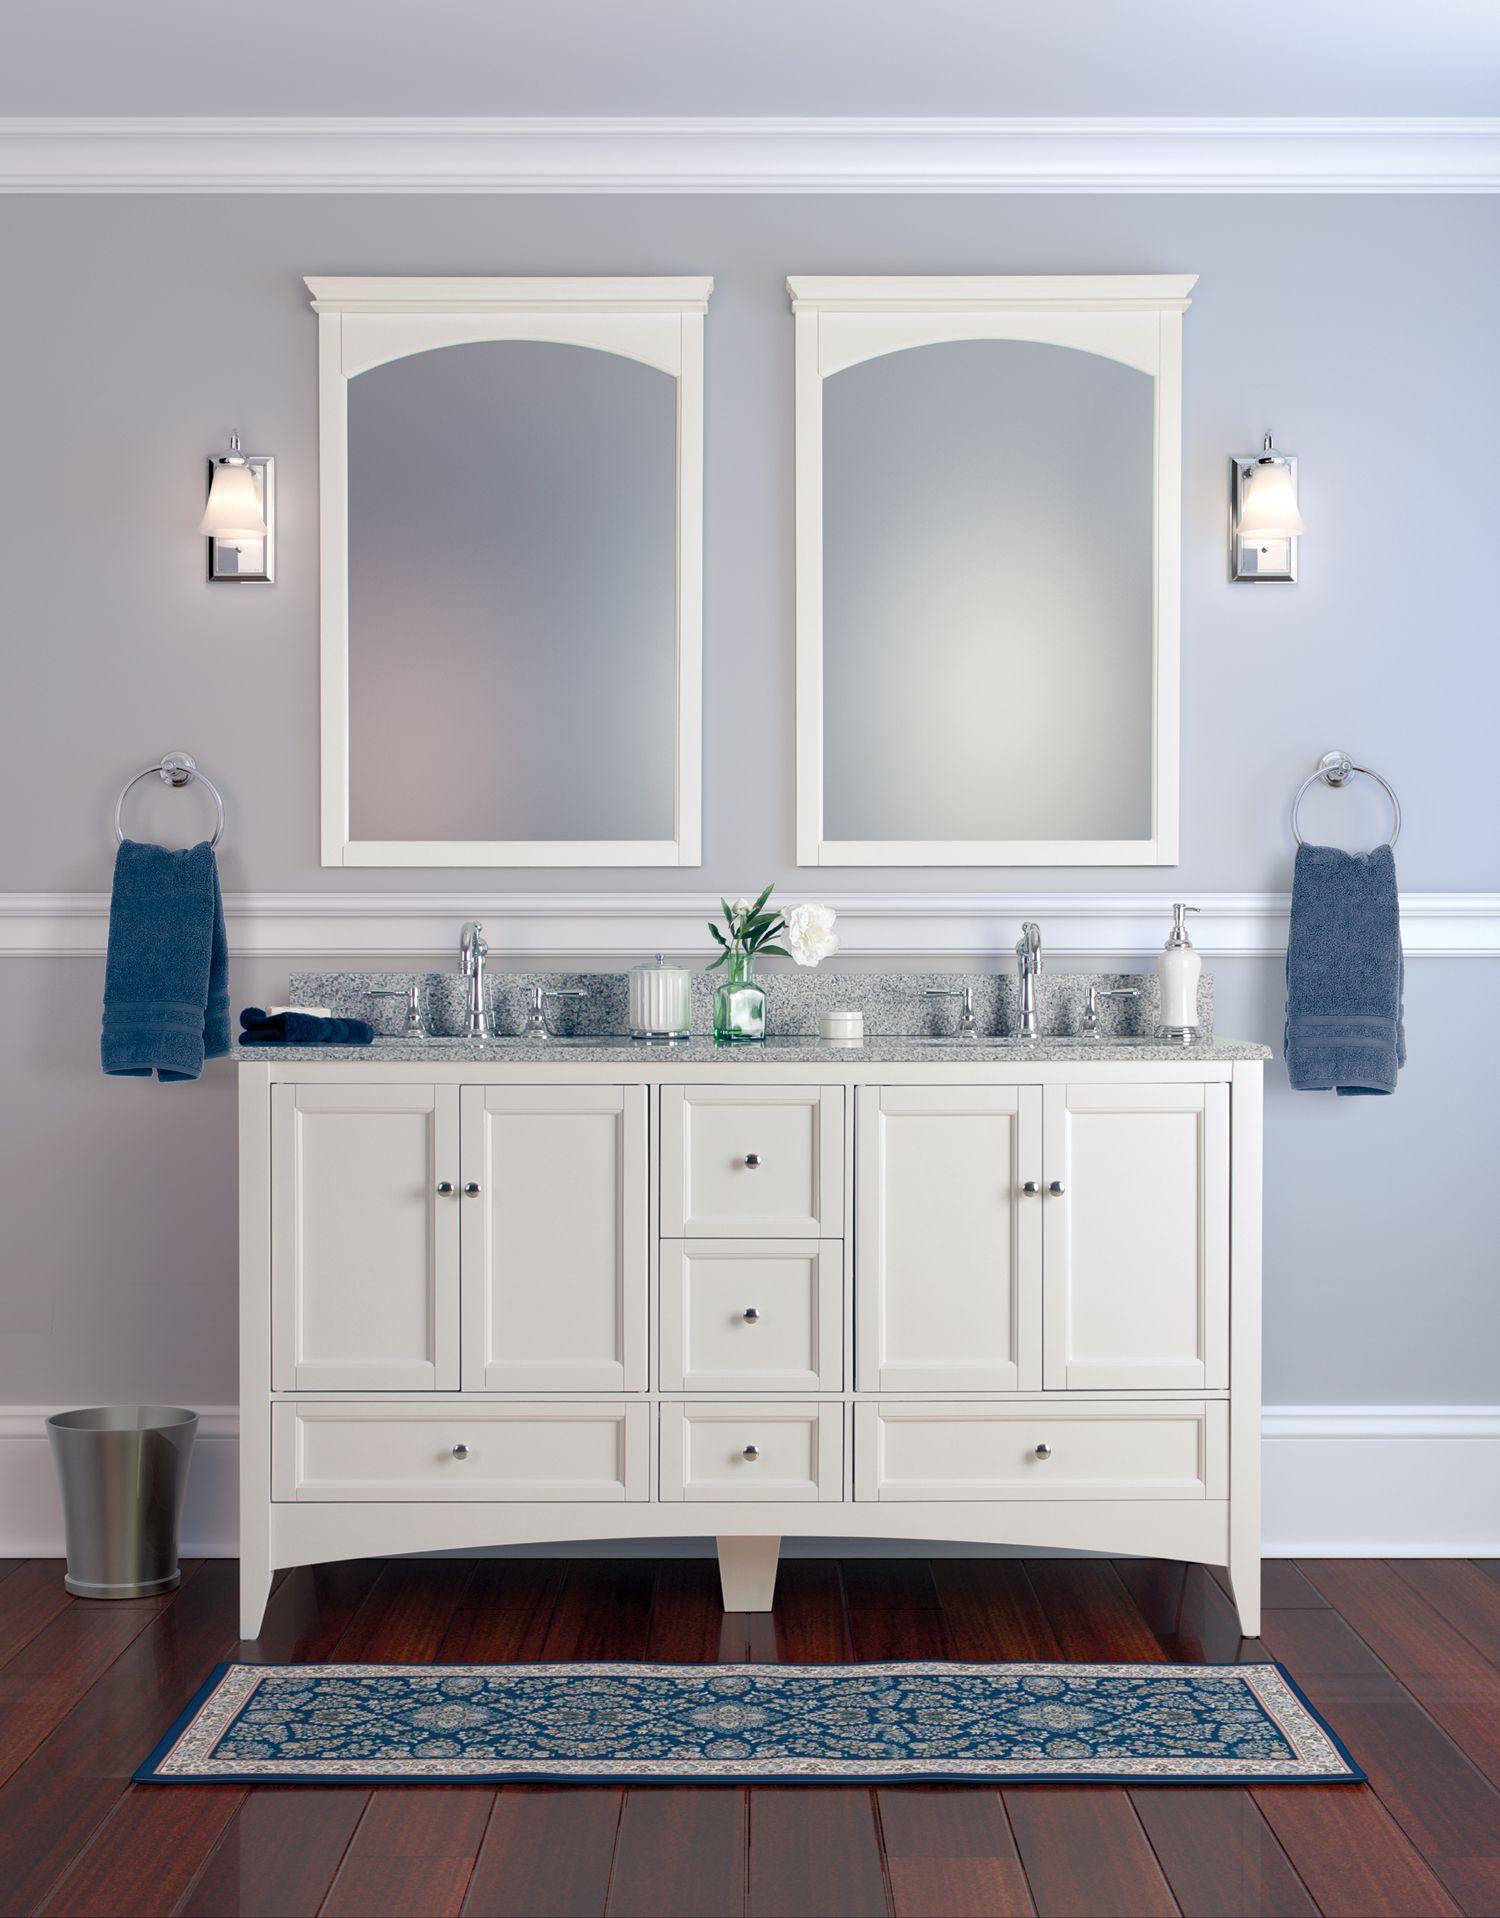 white bathroom mirror with shelf | ThePlanMagazine.com | Minimalist ...